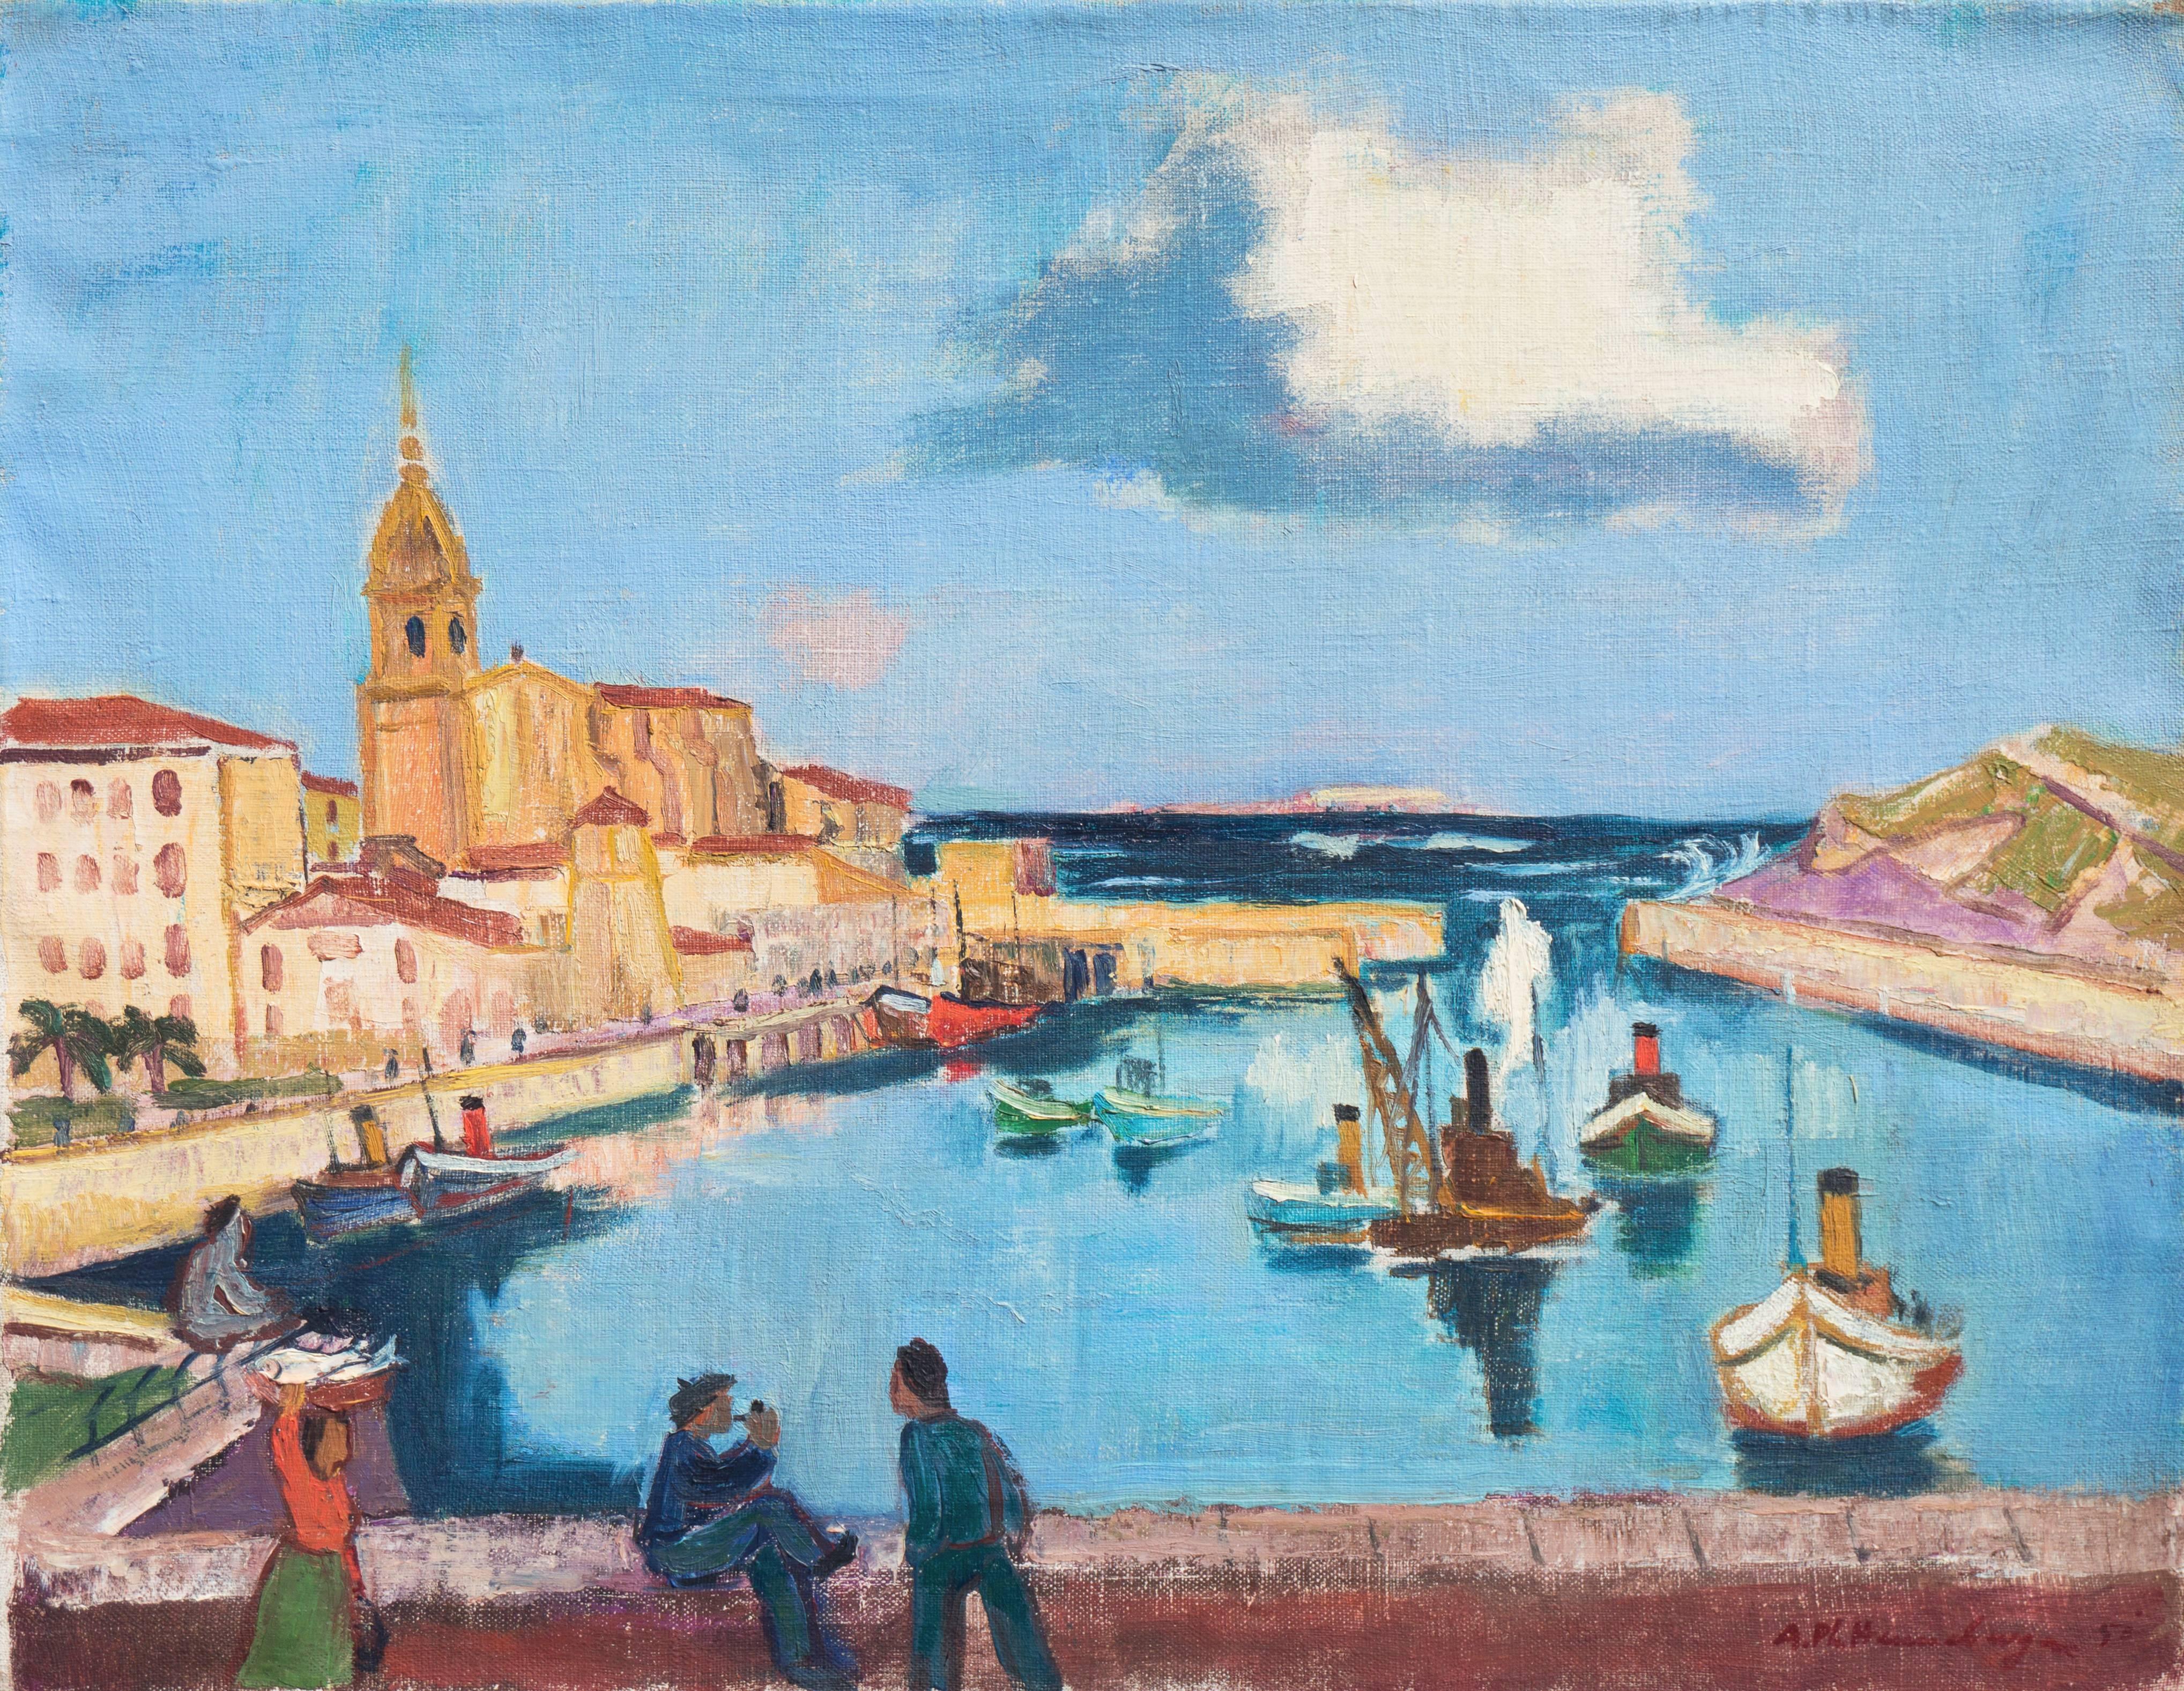 'The Basque Harbor at Bermeo, Spain', Munich Art Academy, Karl Caspar